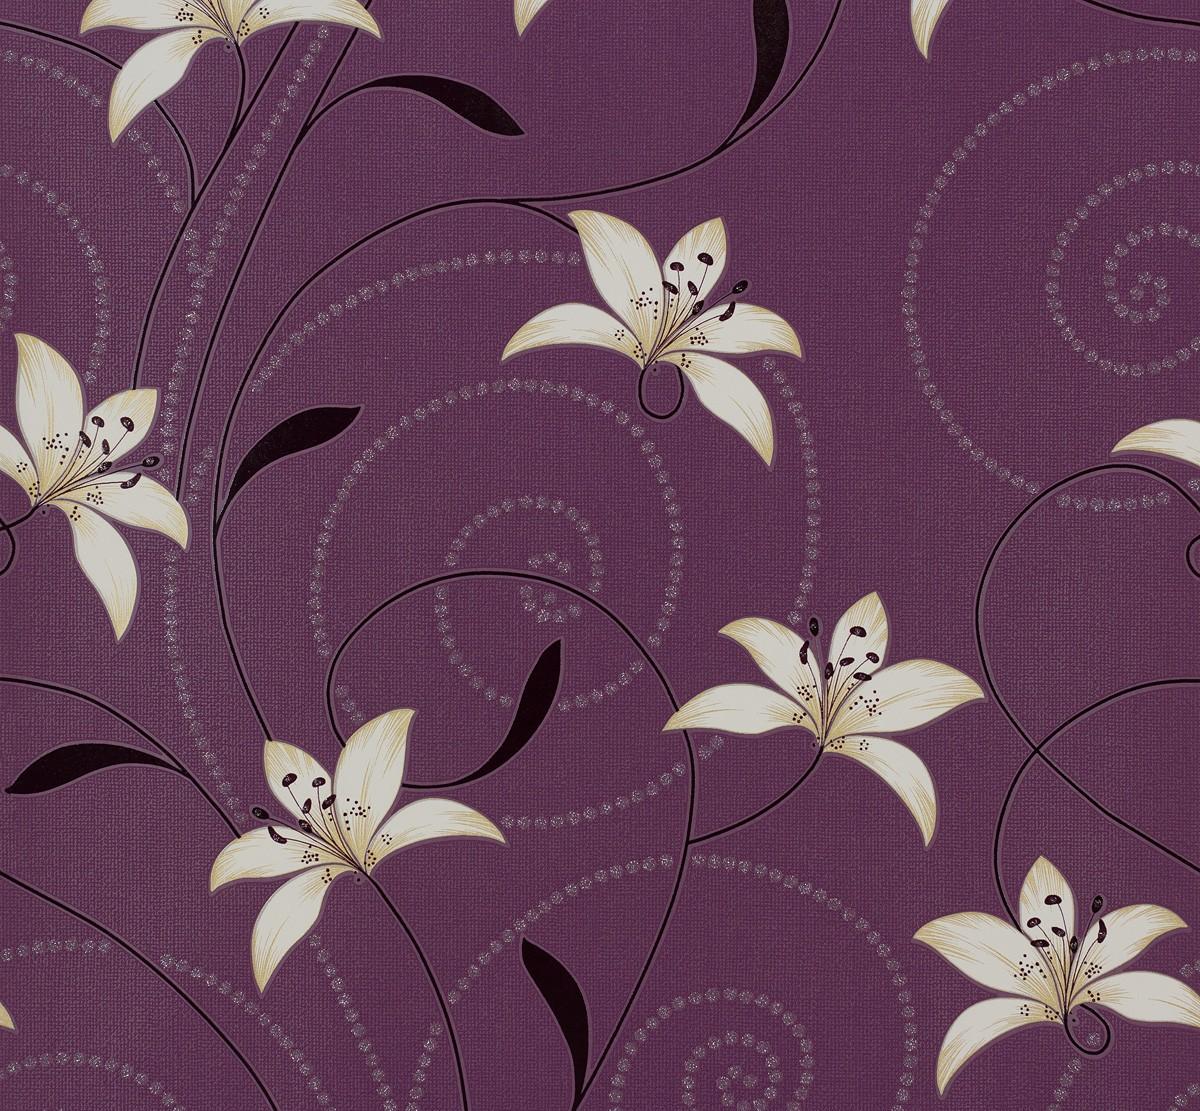 tapete blumen lila creme tapeten livingwalls atlanta 95700. Black Bedroom Furniture Sets. Home Design Ideas